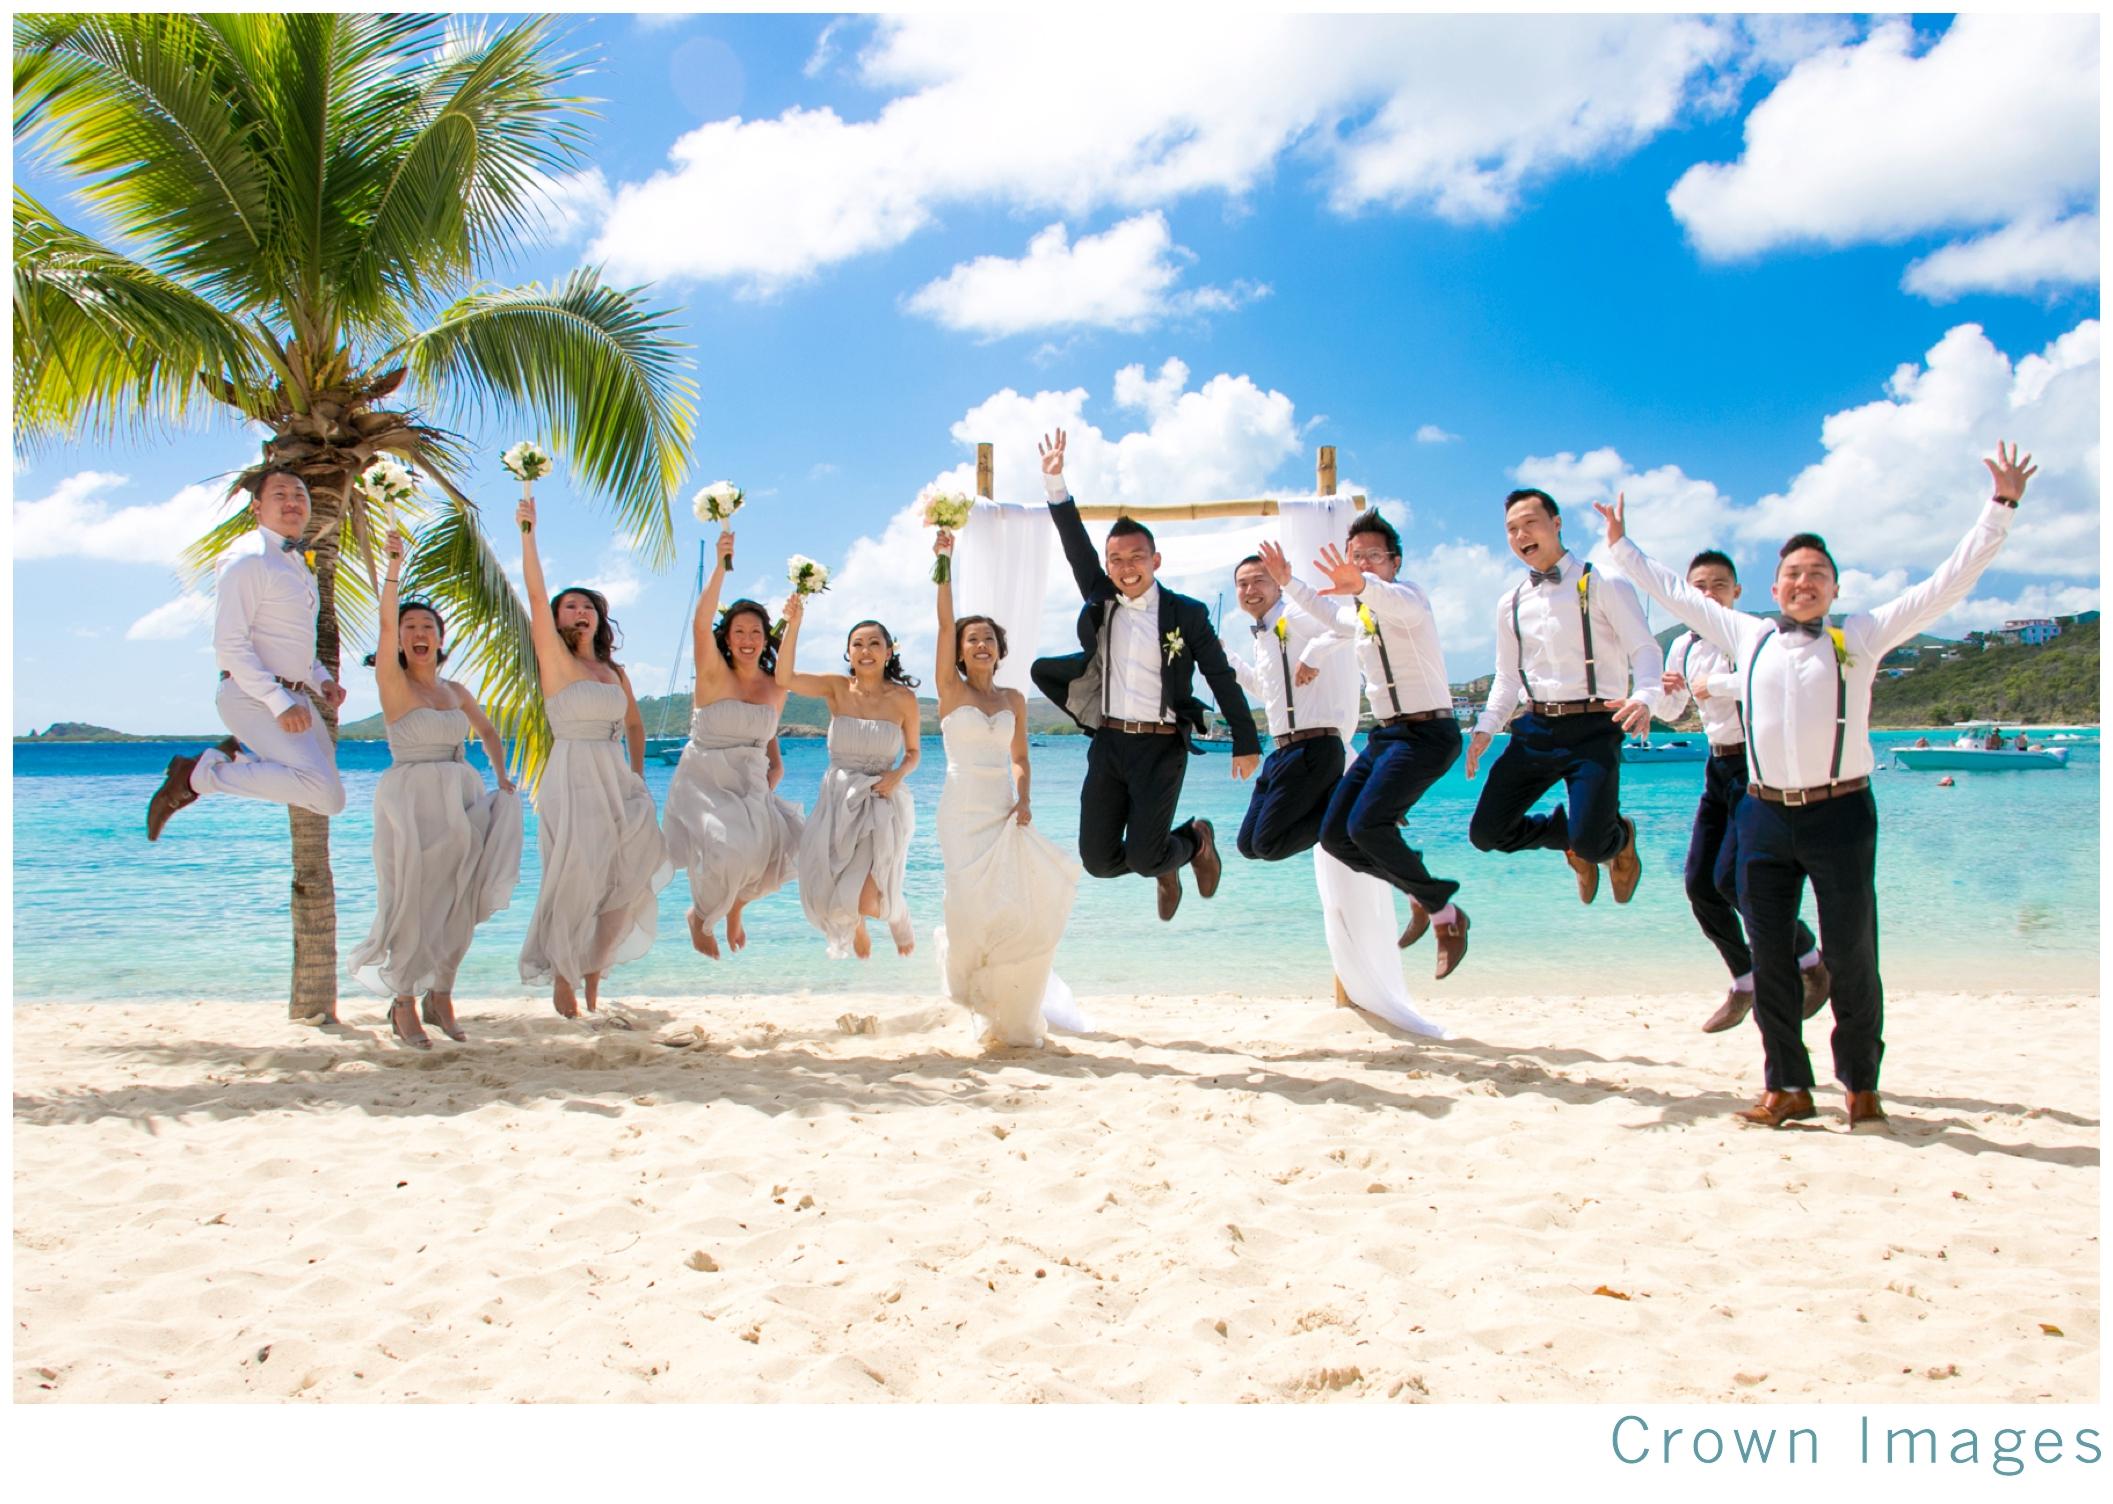 st_thomas_wedding_photographer_0803.jpg